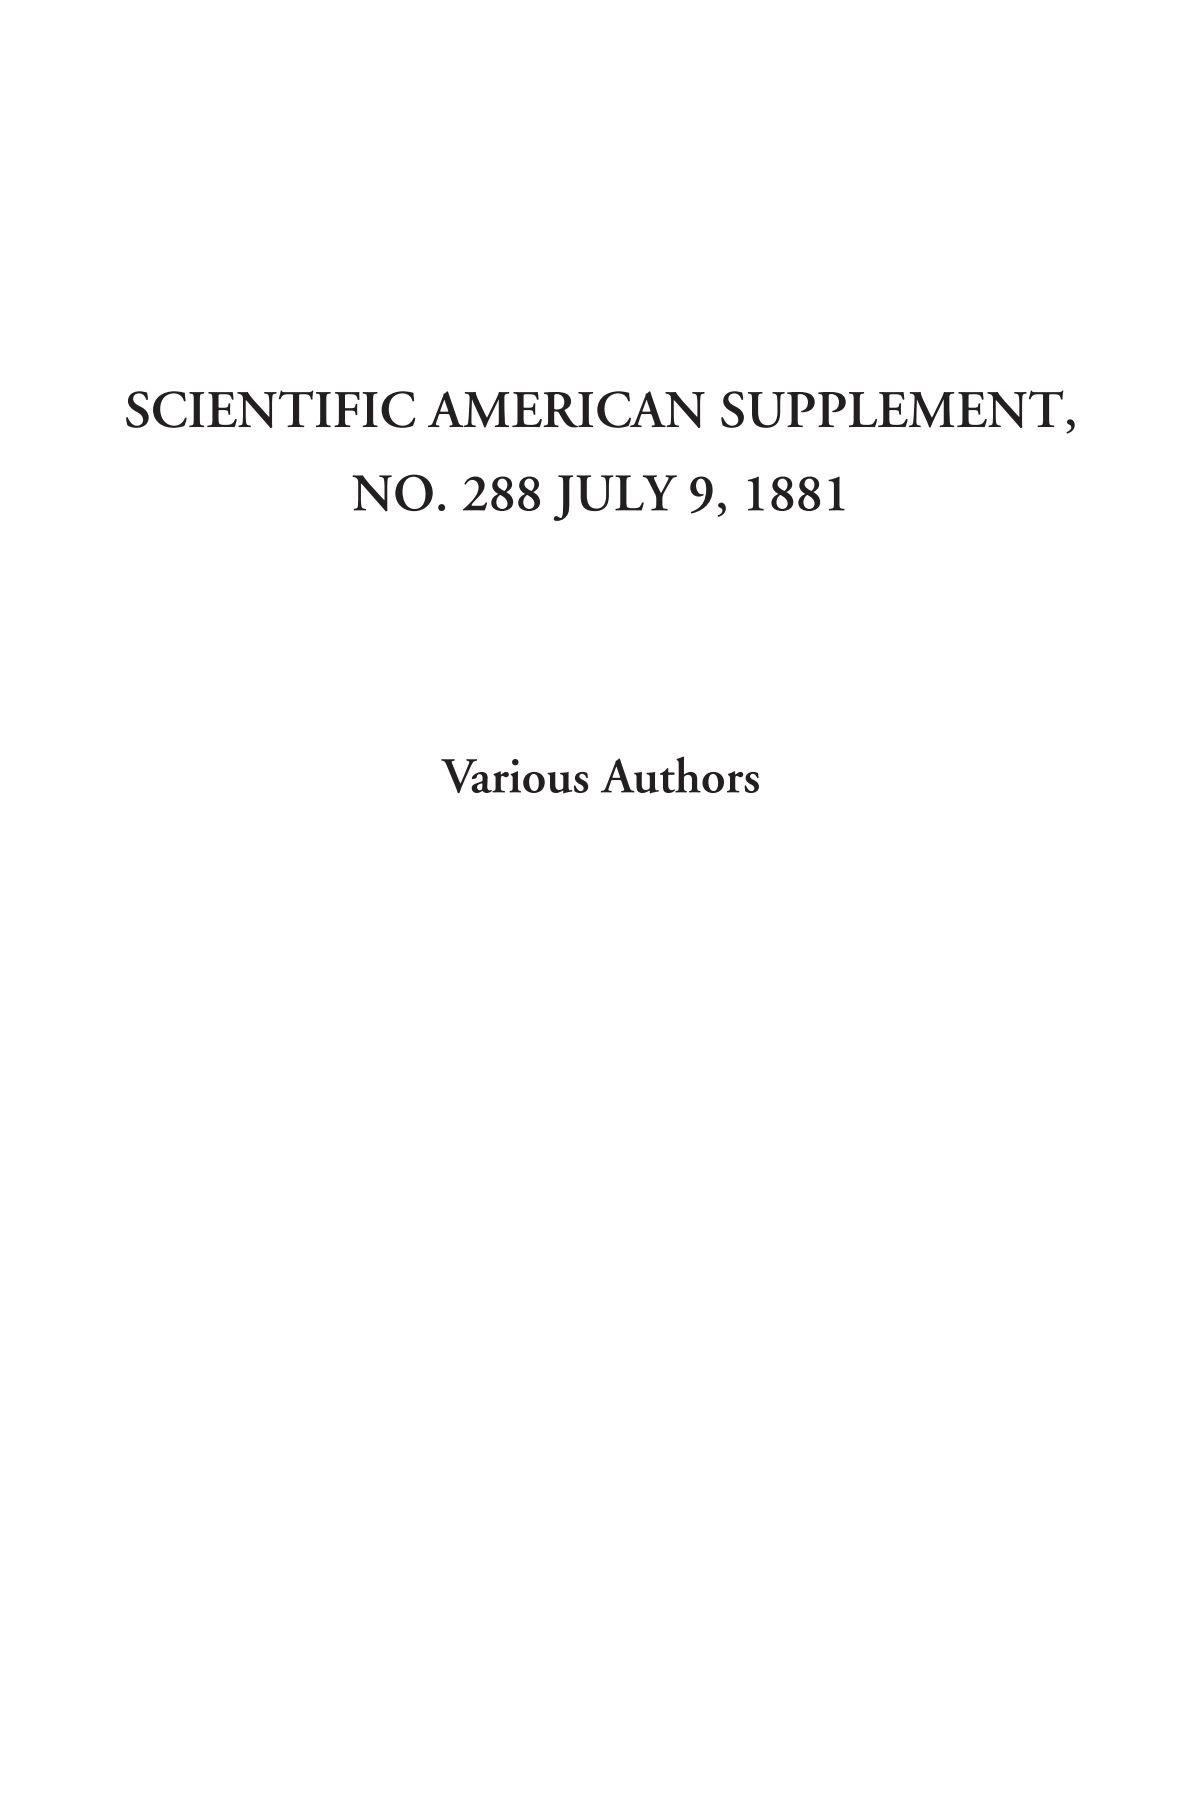 Scientific American Supplement, No. 288 July 9, 1881 PDF